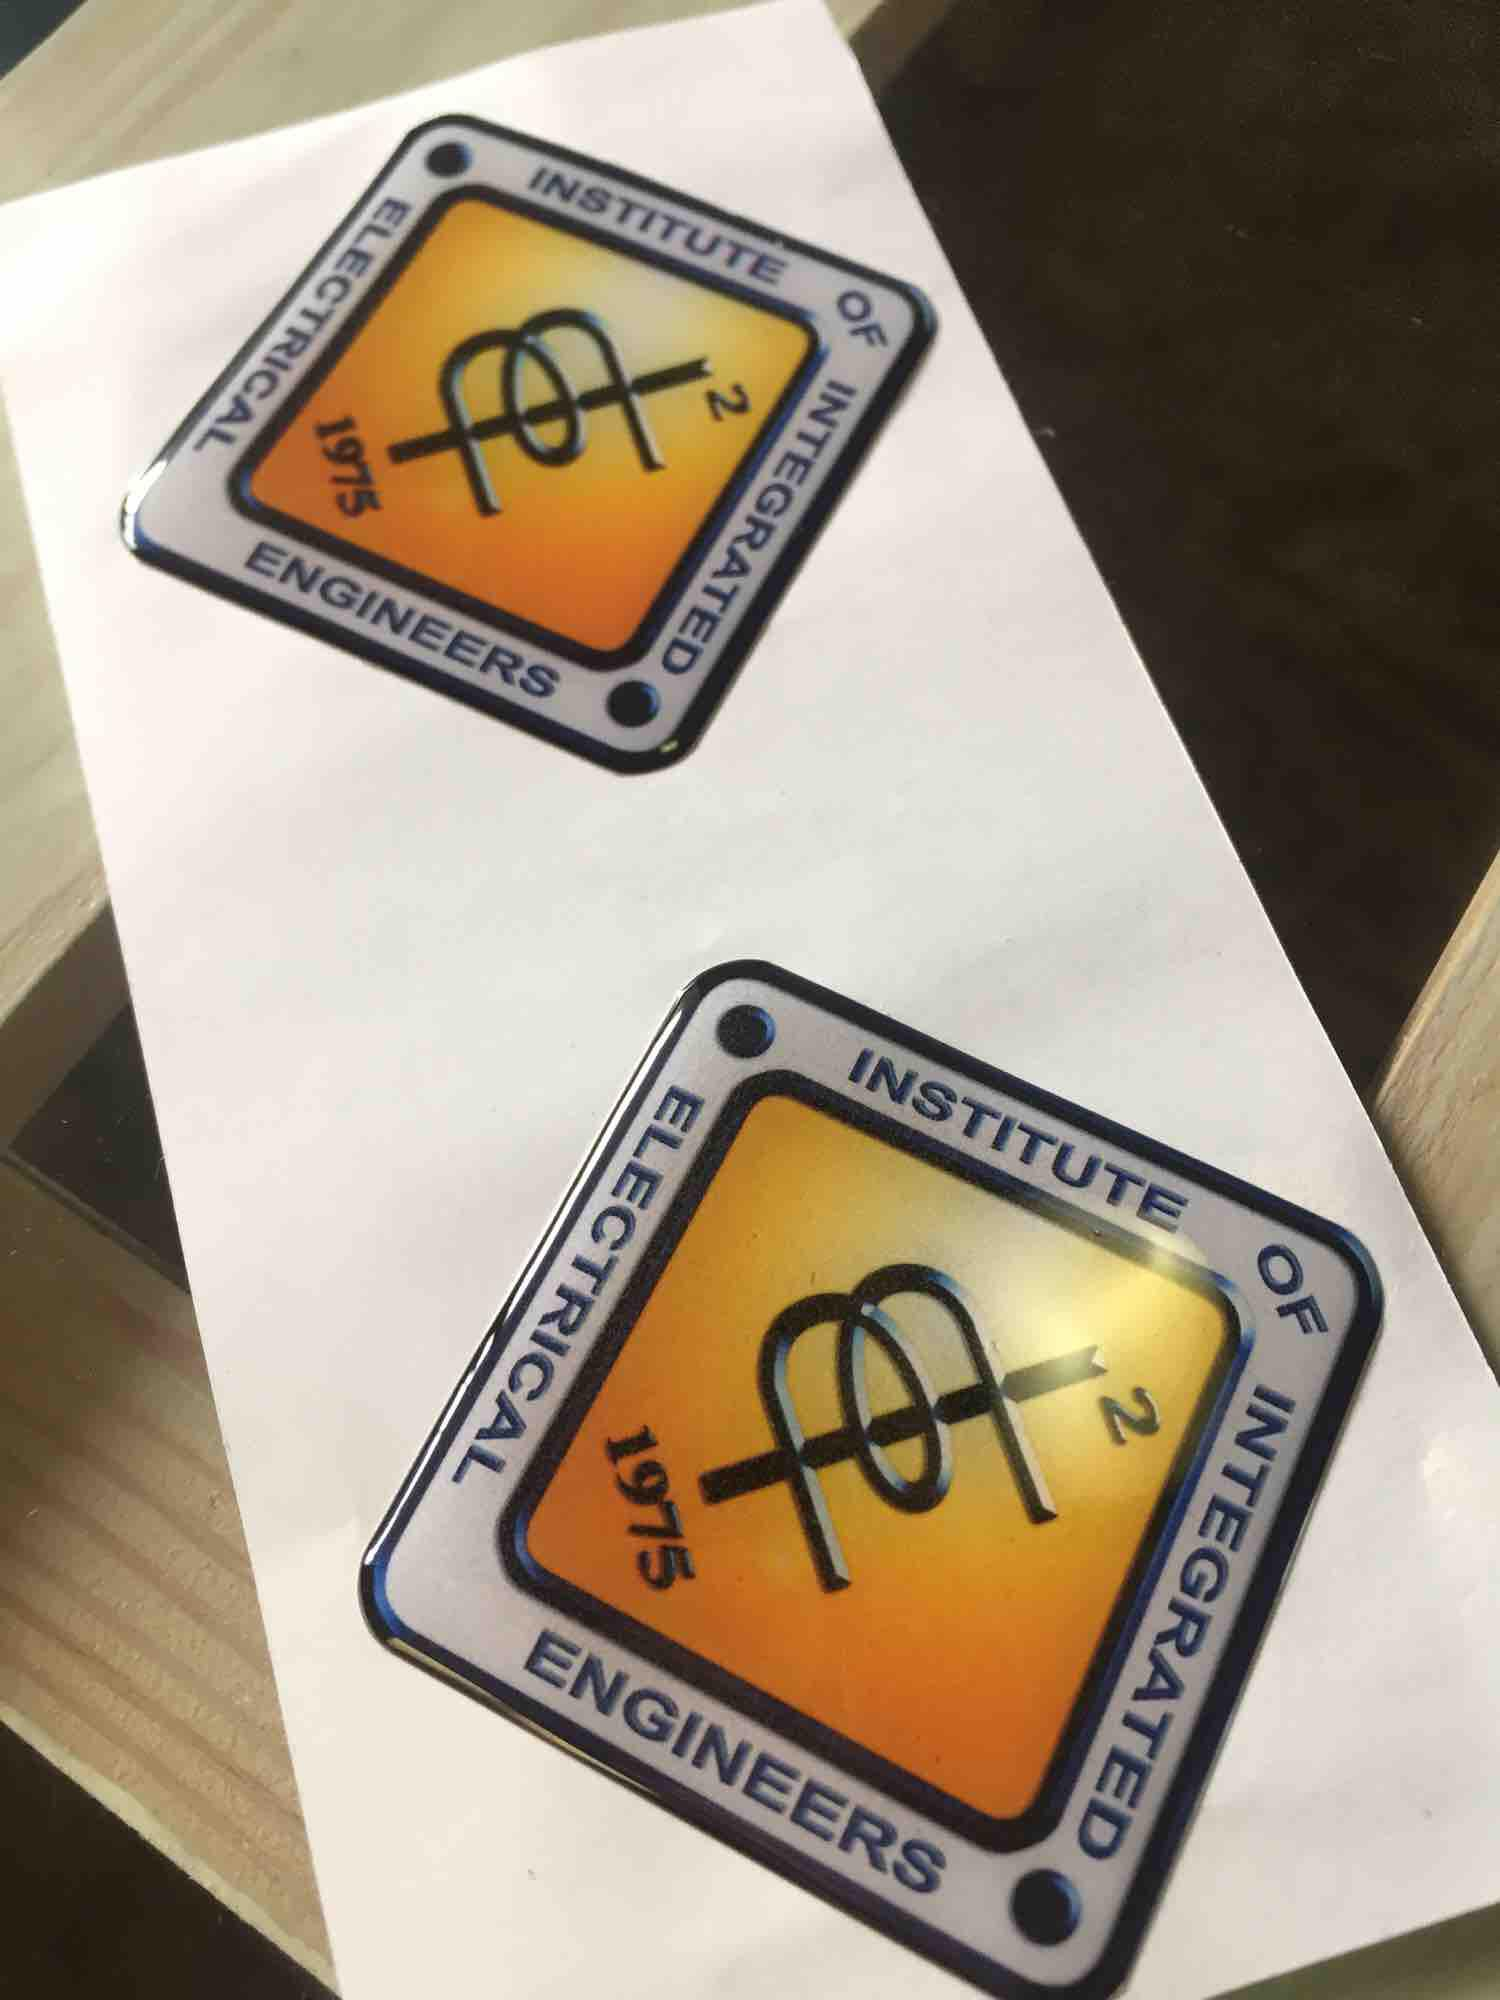 3d Electrical Engineer Emblem By Idyourcar.